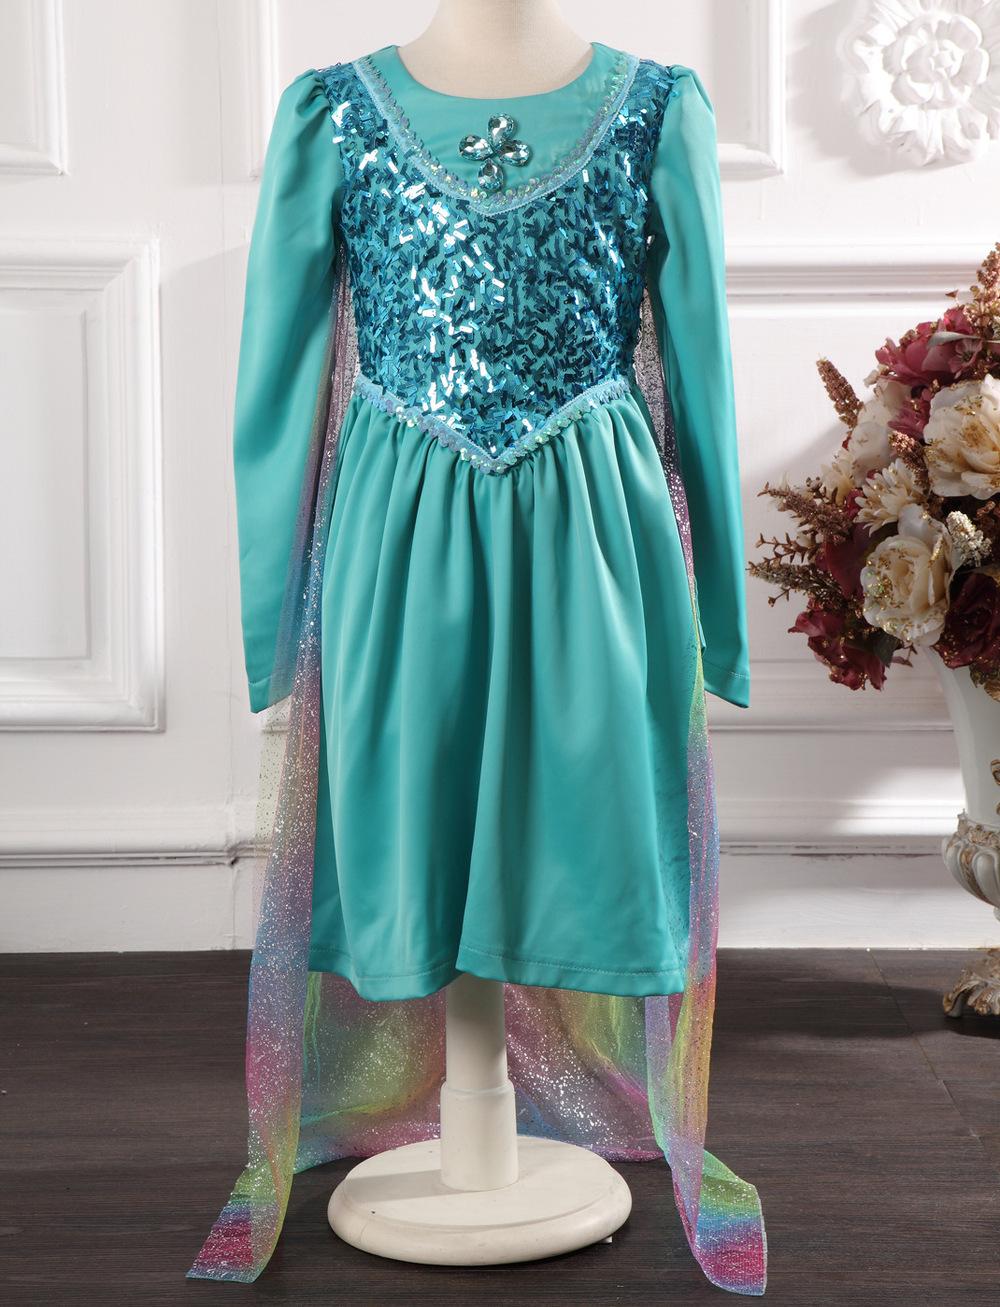 NEW Children's Dress Elsa Dress Baby Girls Dress Party costume(China (Mainland))